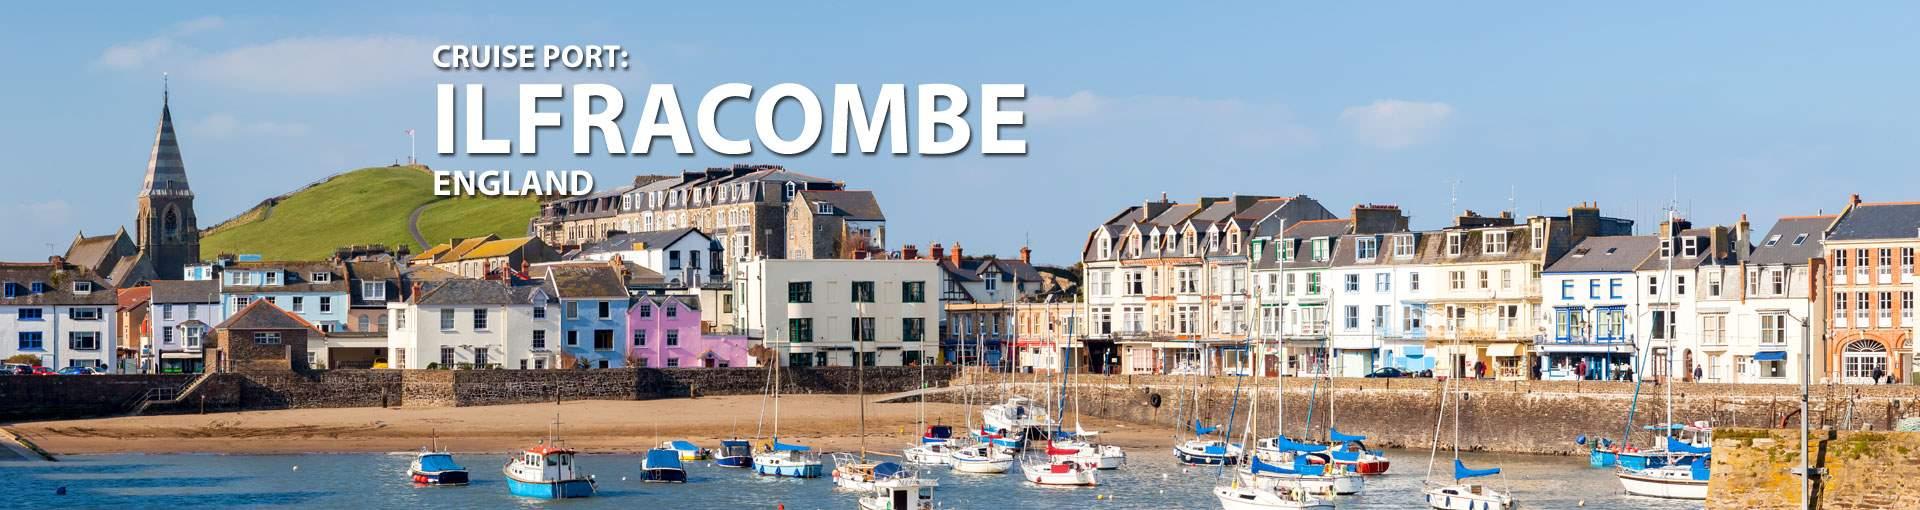 Cruises to Ilfracombe, England